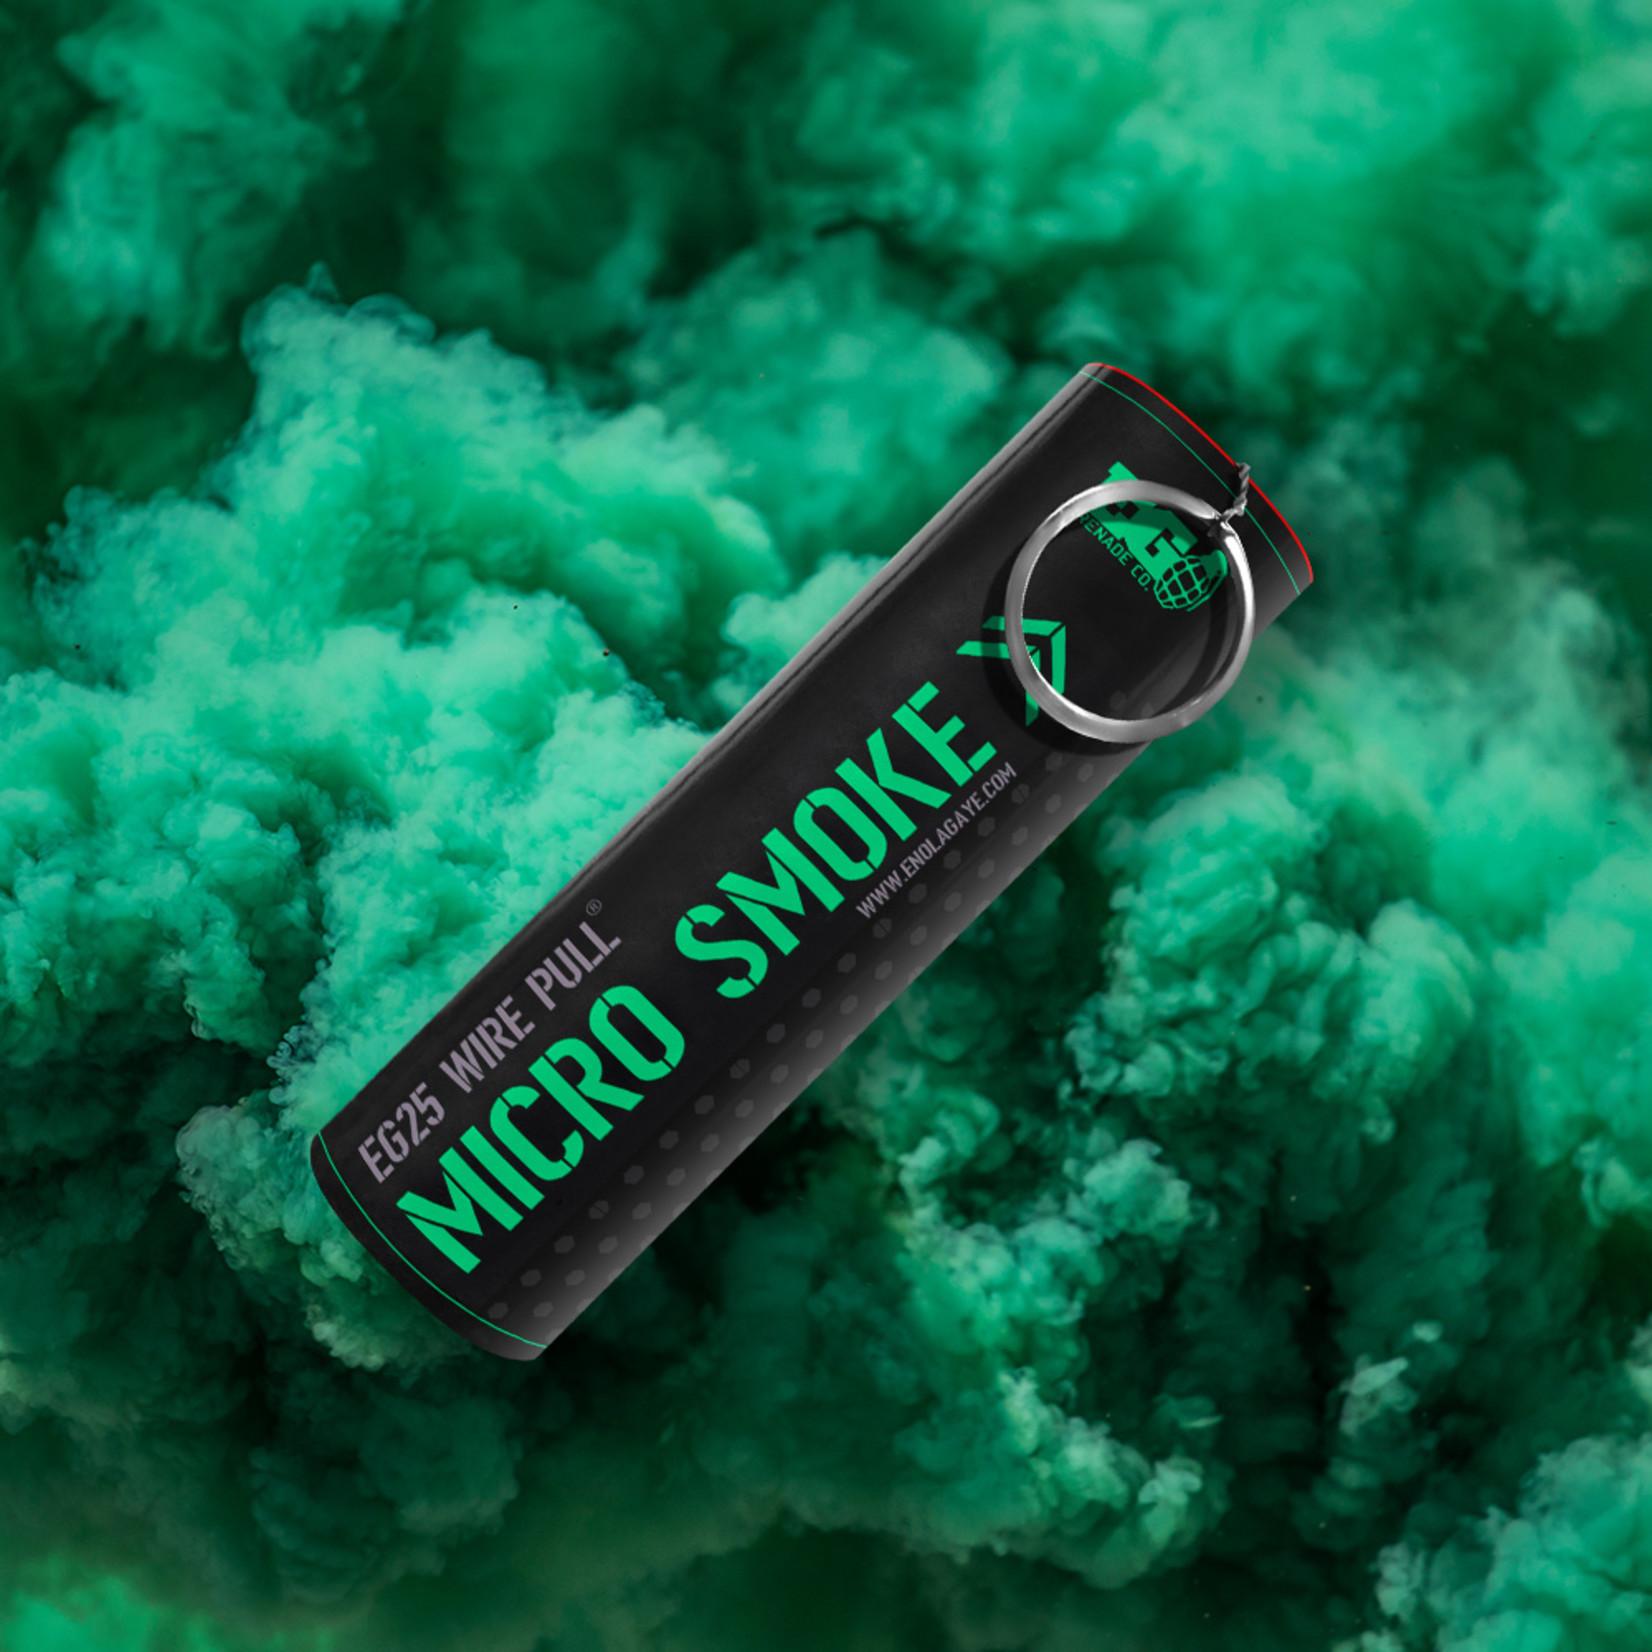 EG25 Micro Smoke Grenade Green